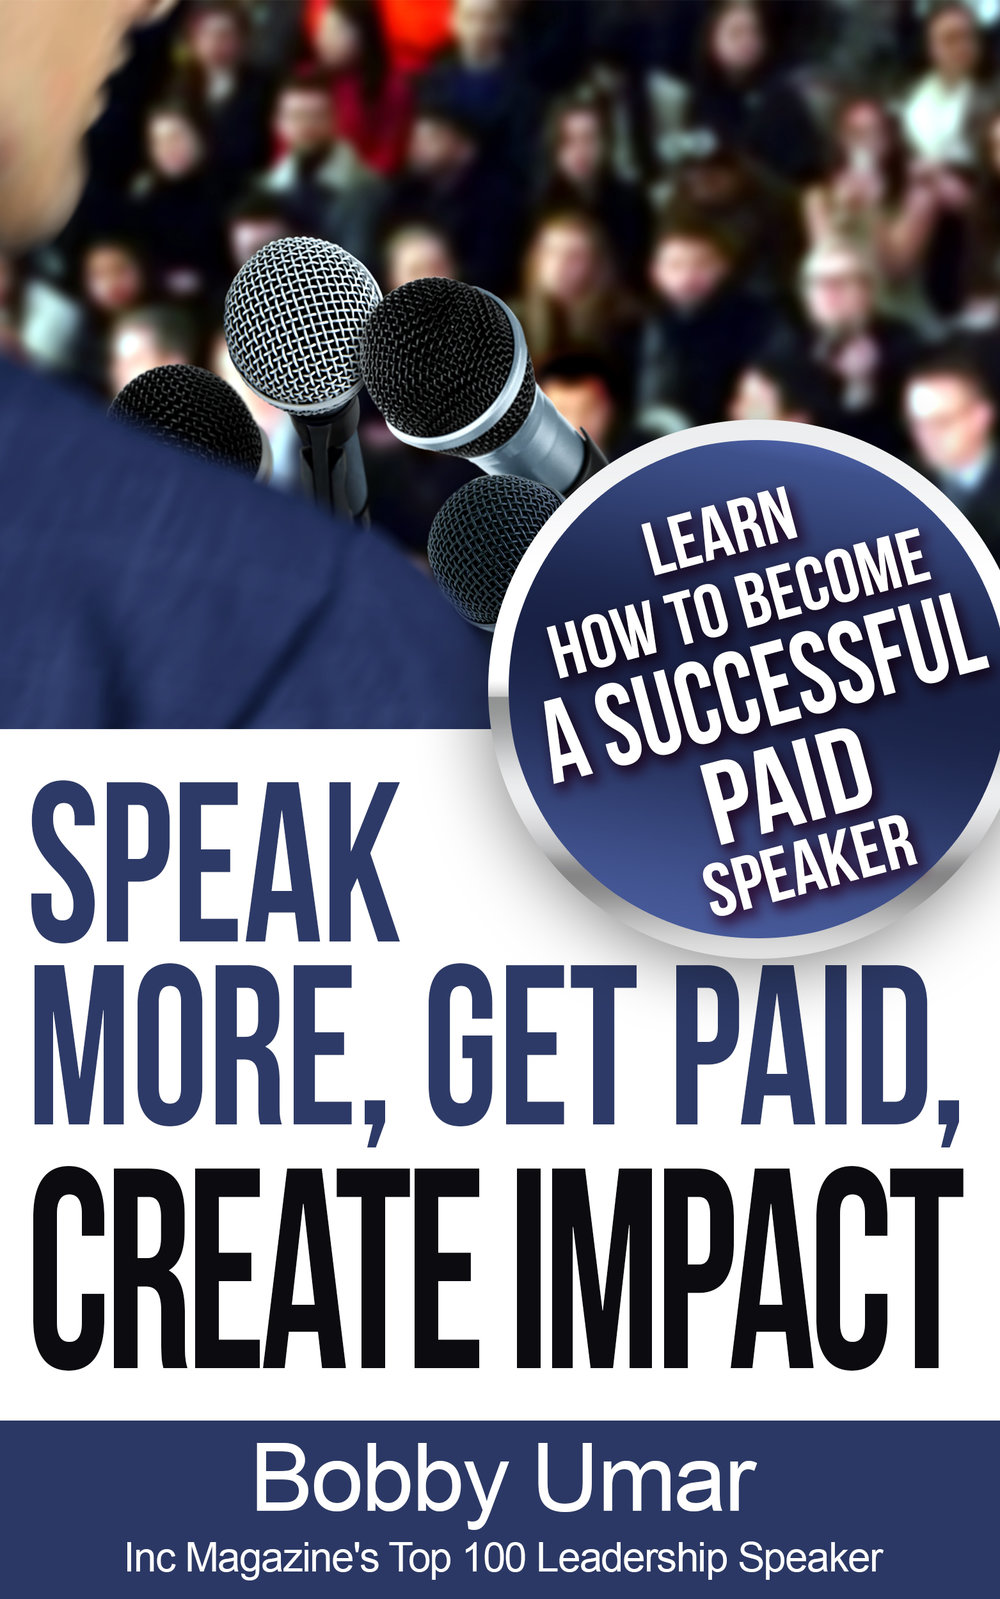 SPEAK_MORE_GET_PAID_MAKE_IMPACT.jpg